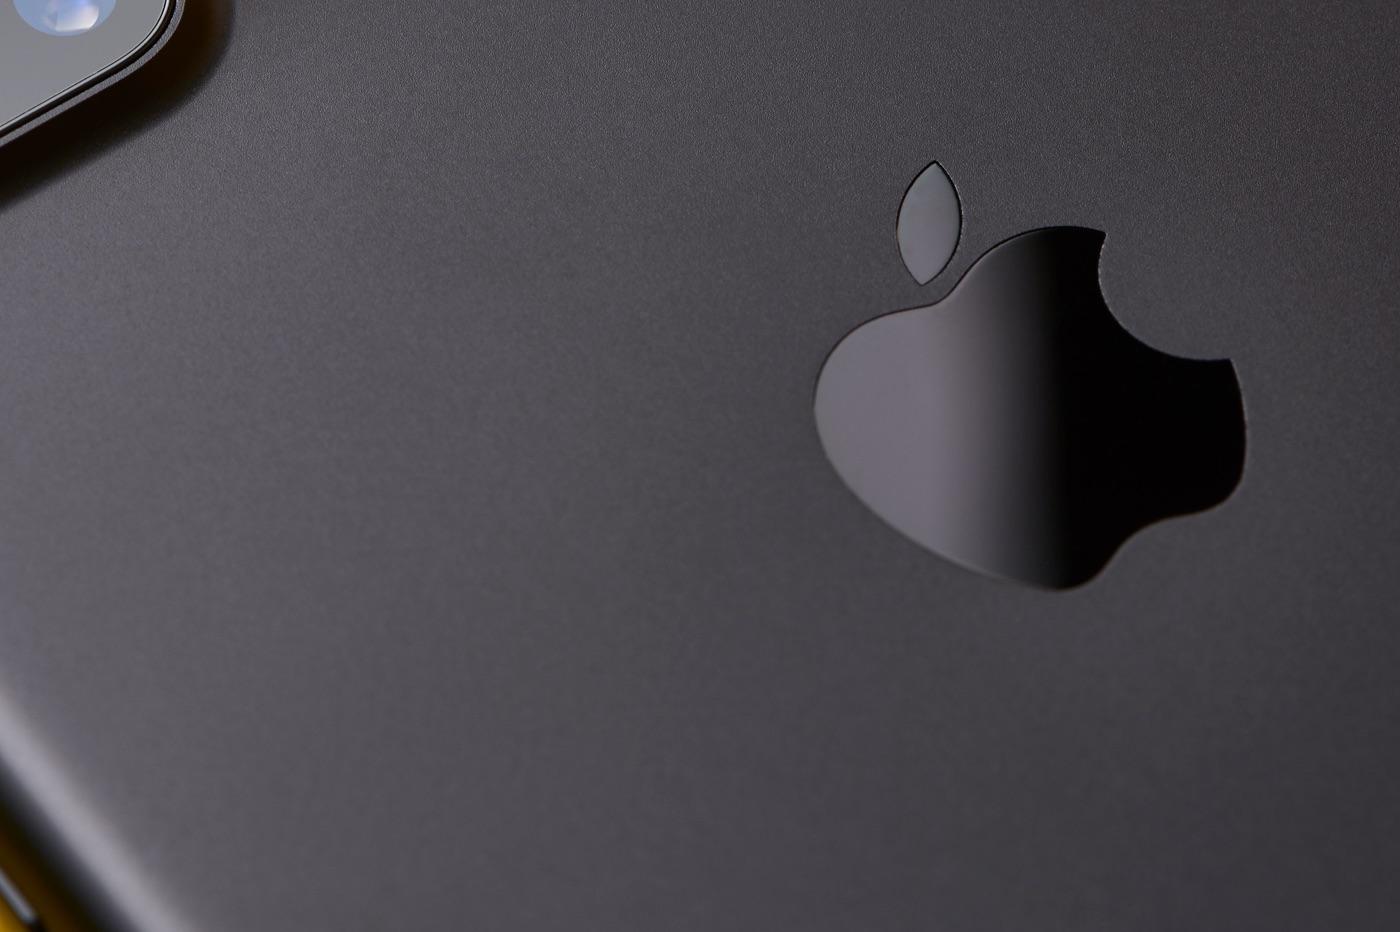 Dos iPhone noir logo pomme